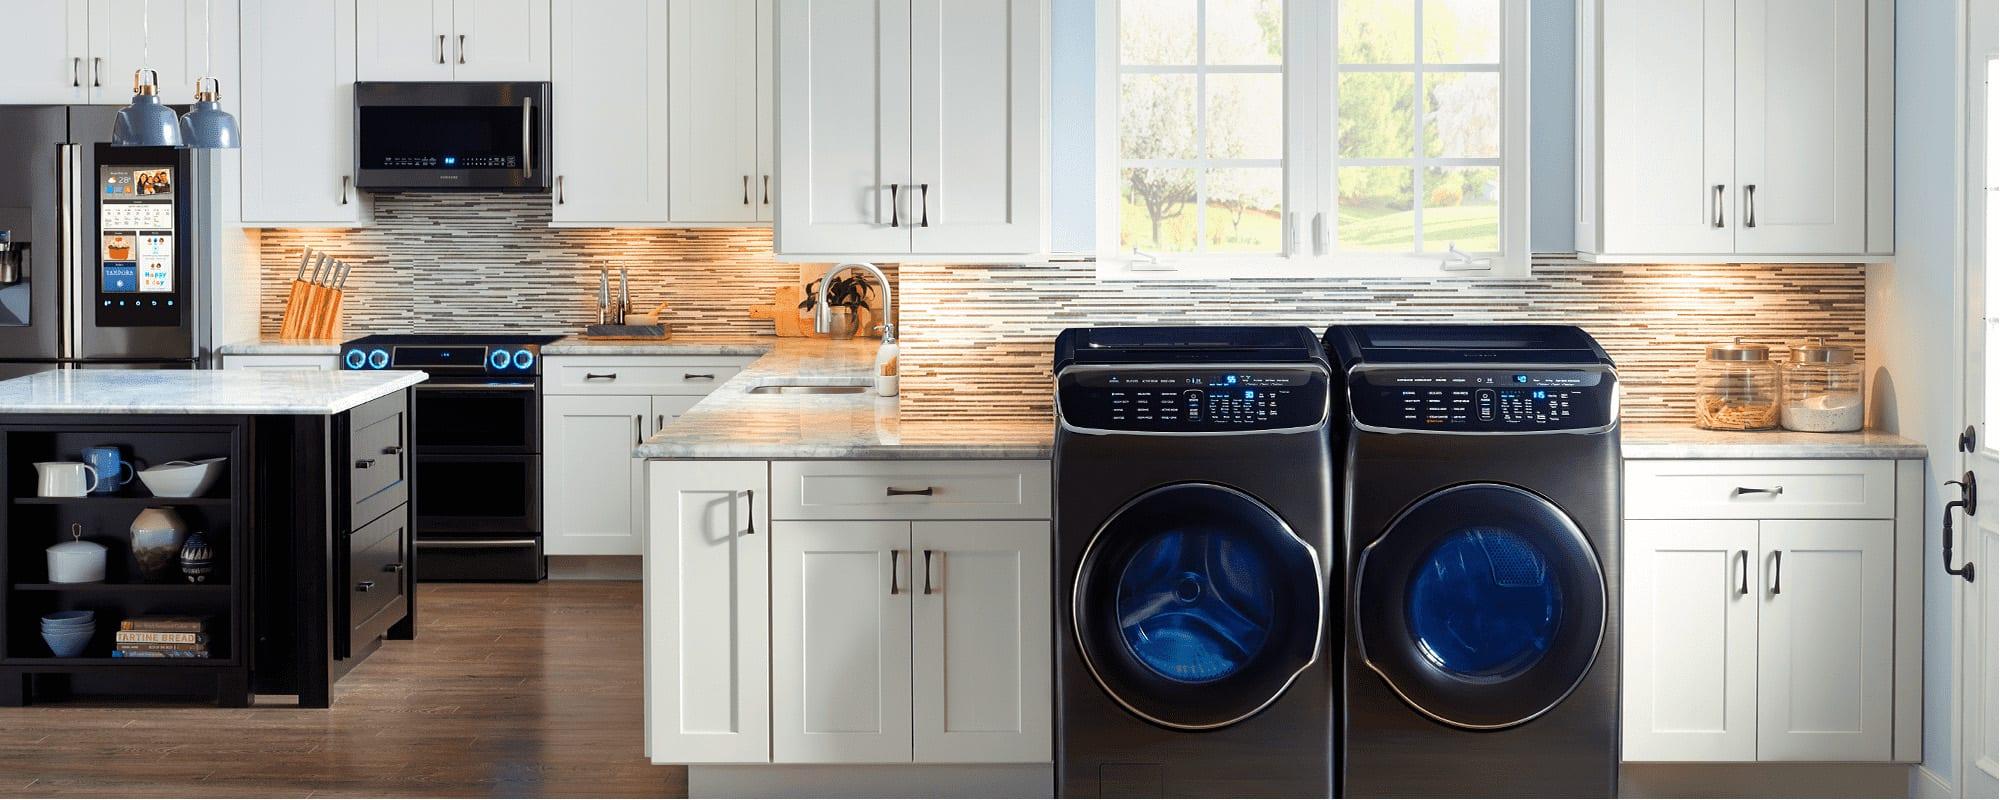 Samsung Appliances Living